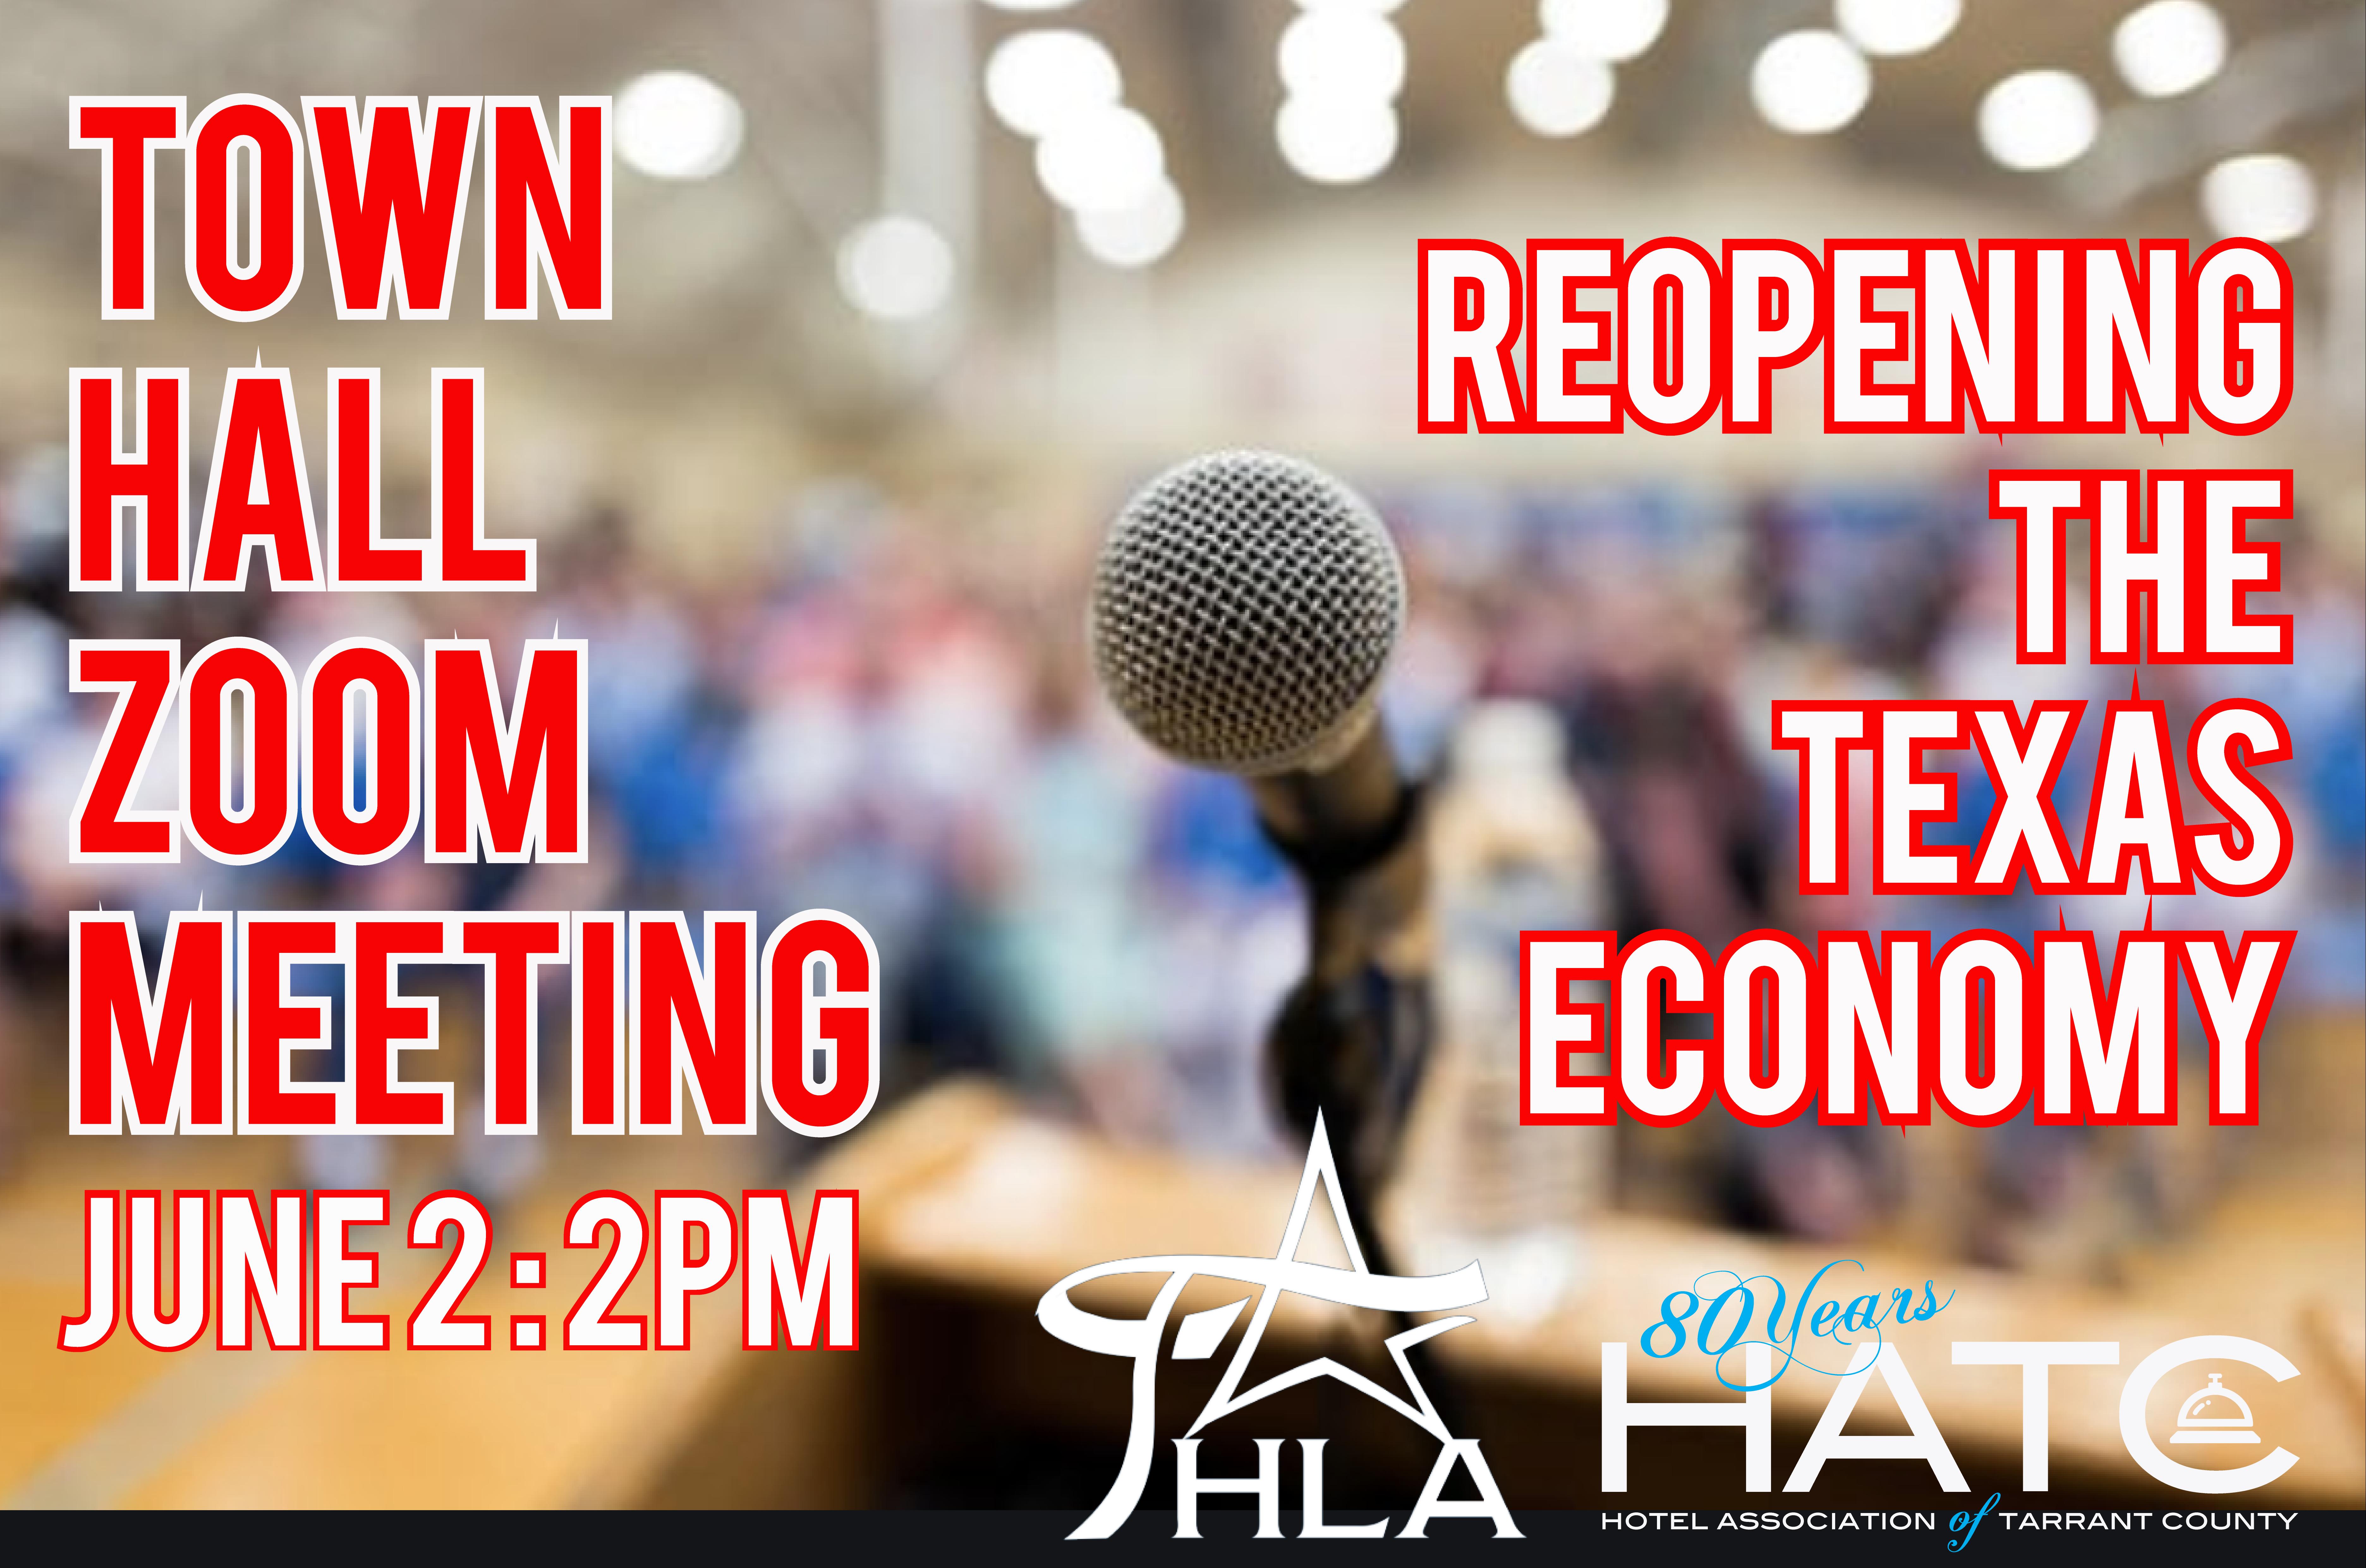 June Webinar ReOpening the Texas Economy